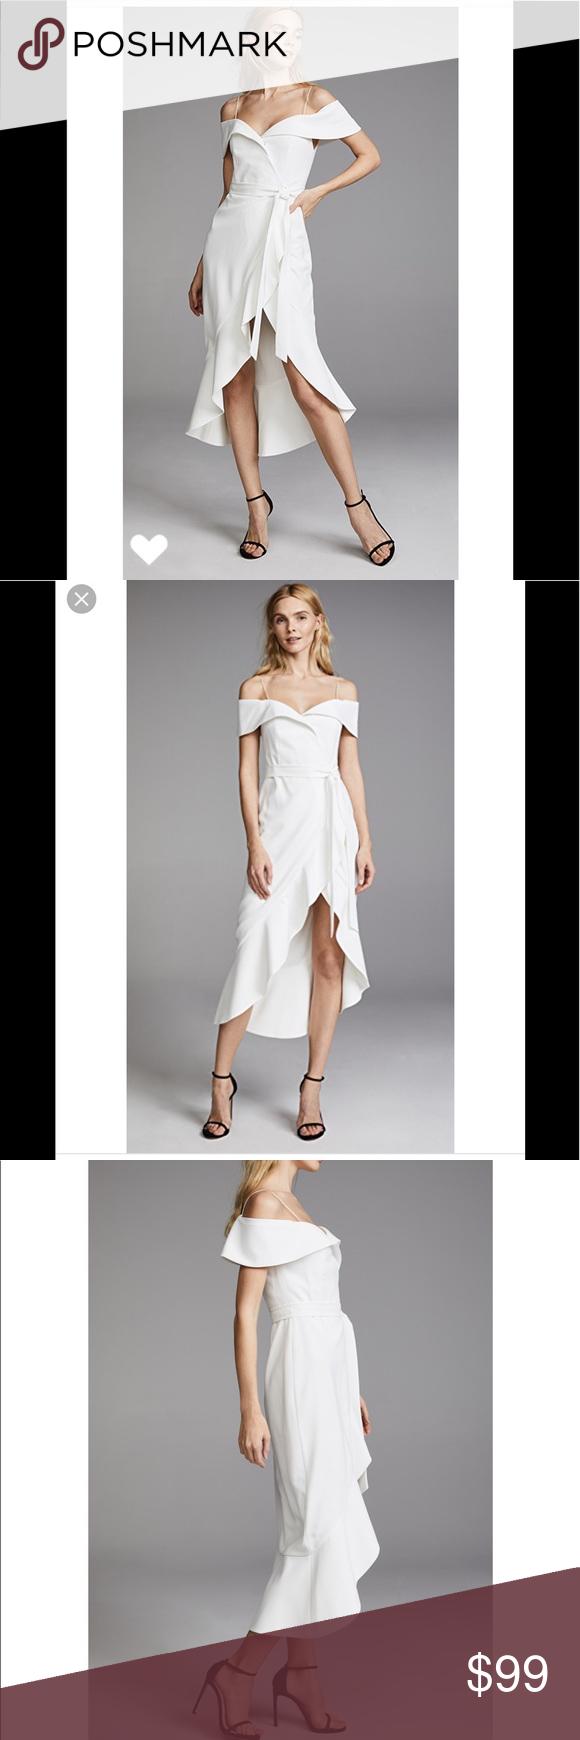 717237090a Alice & Olivia Josie cream wrap white dress Sz 4 alice + olivia Josie  Off